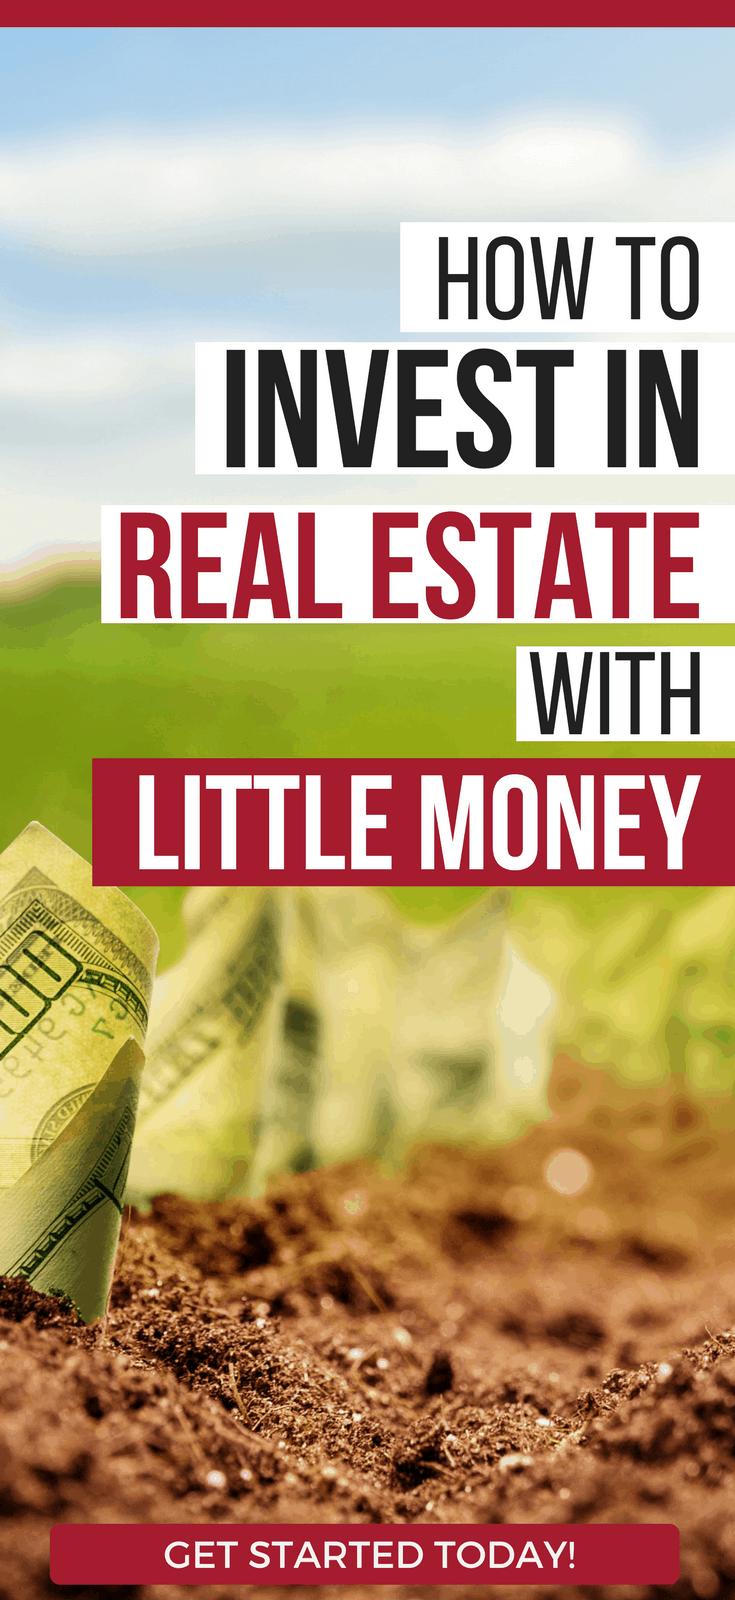 PeerStreet Review: How It Works, Minimum Investment, & MoreGet Started Investing In Real Estate With Little Moneypeerstreet | real estate investing | crowdfunding real estate | investing in real estate notes#thewaystowealth #investing #realestate #peerstreet